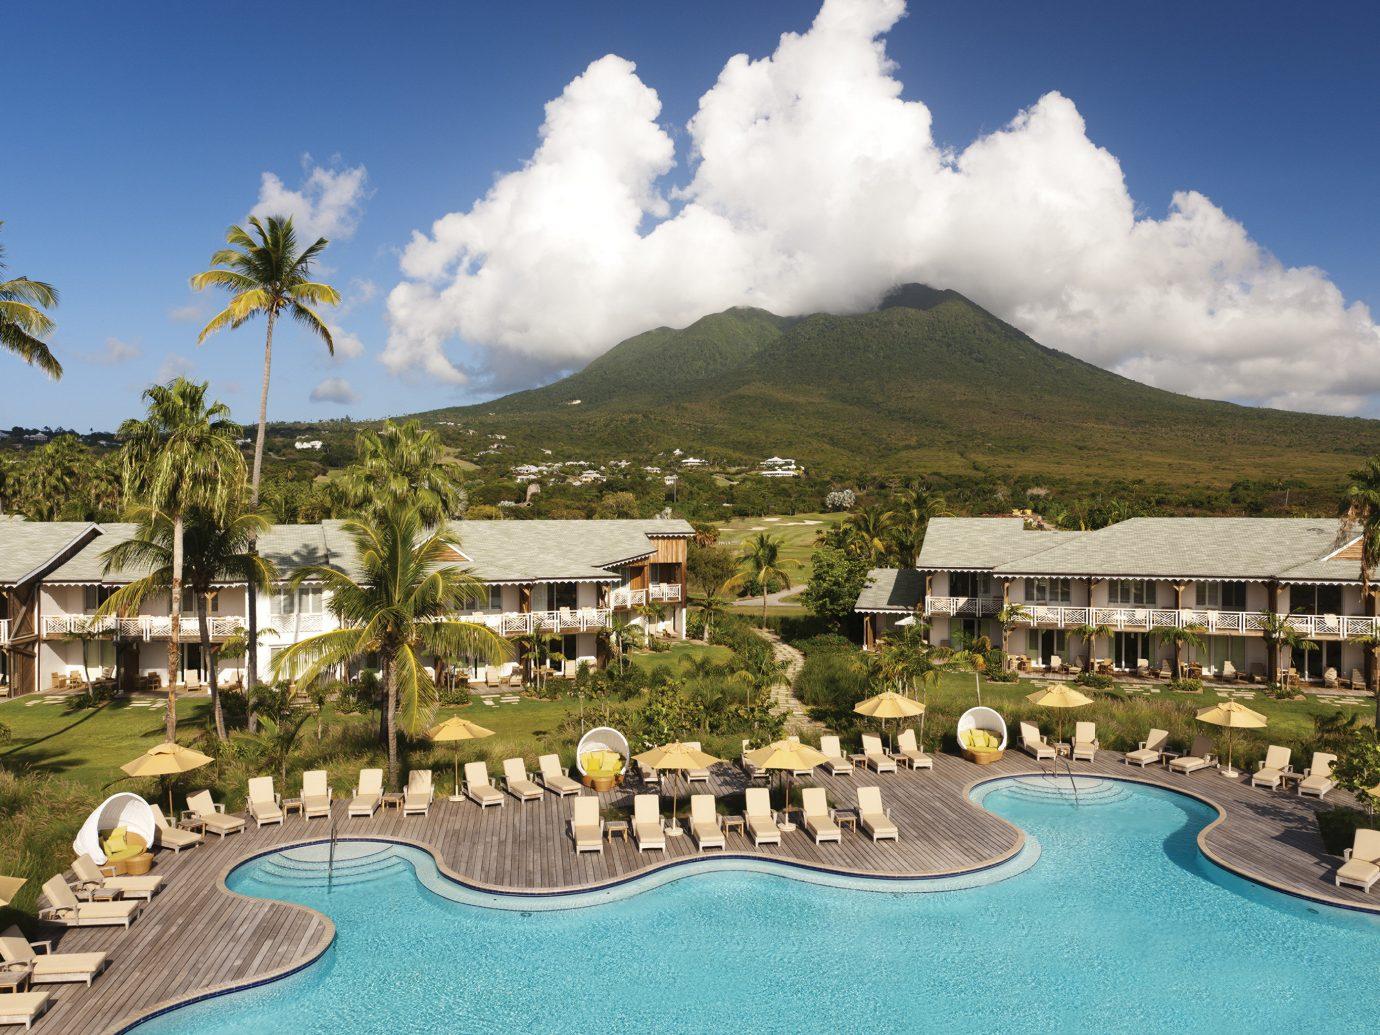 Pool at Four Seasons Resort Nevis, Caribbean